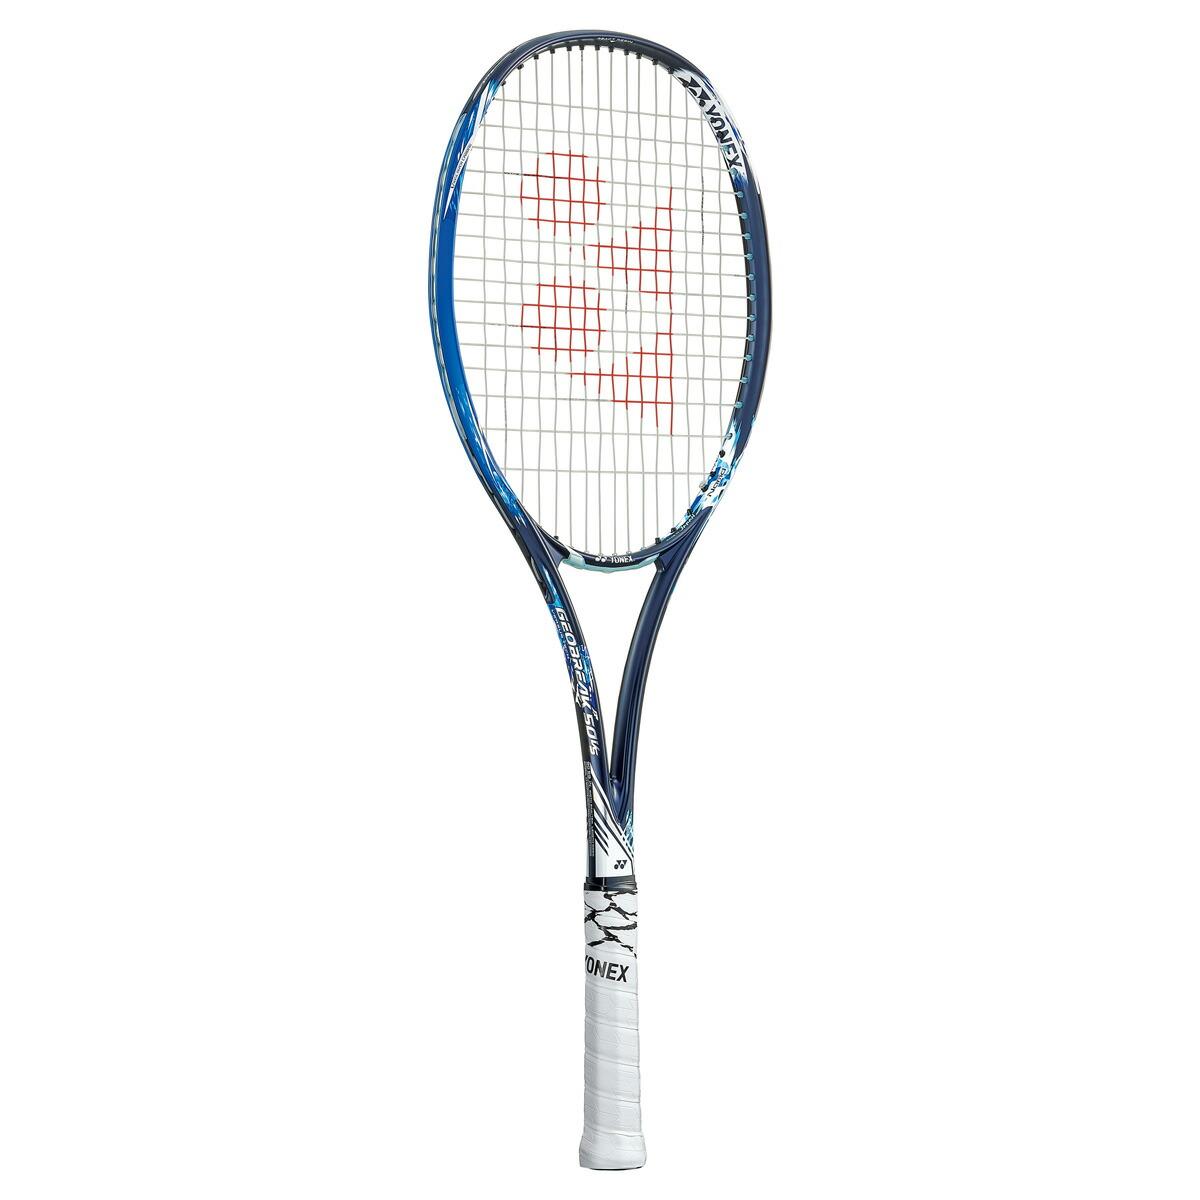 <title>送料無料 ガット張り無料 対象3店舗買いまわり最大10倍 買い物 3 4~スーパーSALE エントリーで全品ポイント10倍 ヨネックス YONEX 軟式テニス ソフトテニスラケット ジオブレイク 50VERSUS GEOBREAK VS バーサス GEO50VS-403</title>